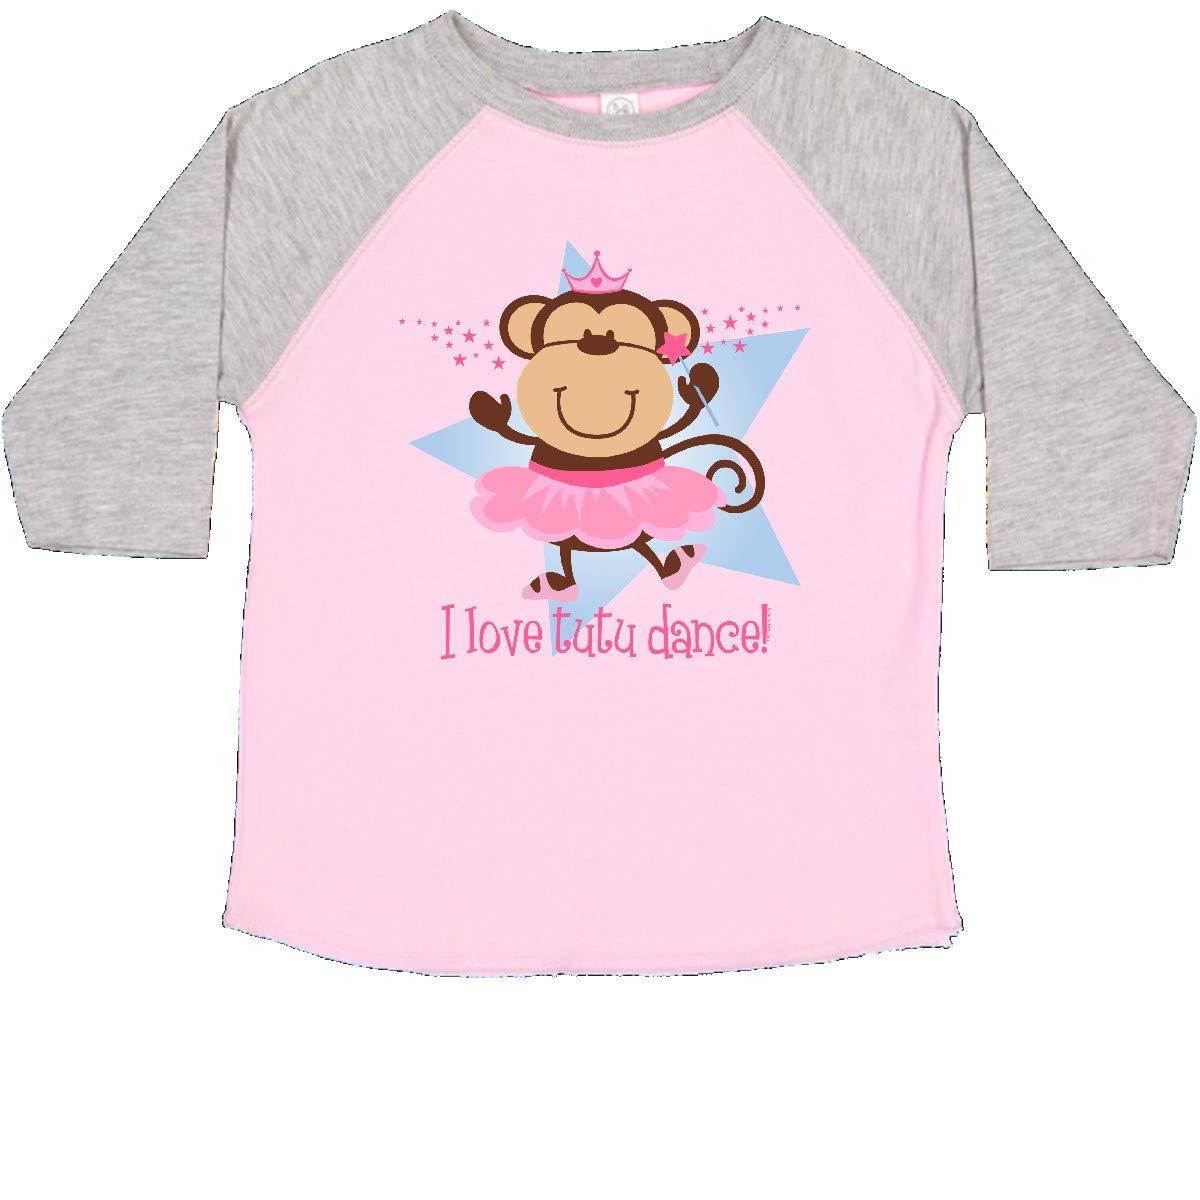 inktastic Monkey Love Tutu Dance Toddler T-Shirt